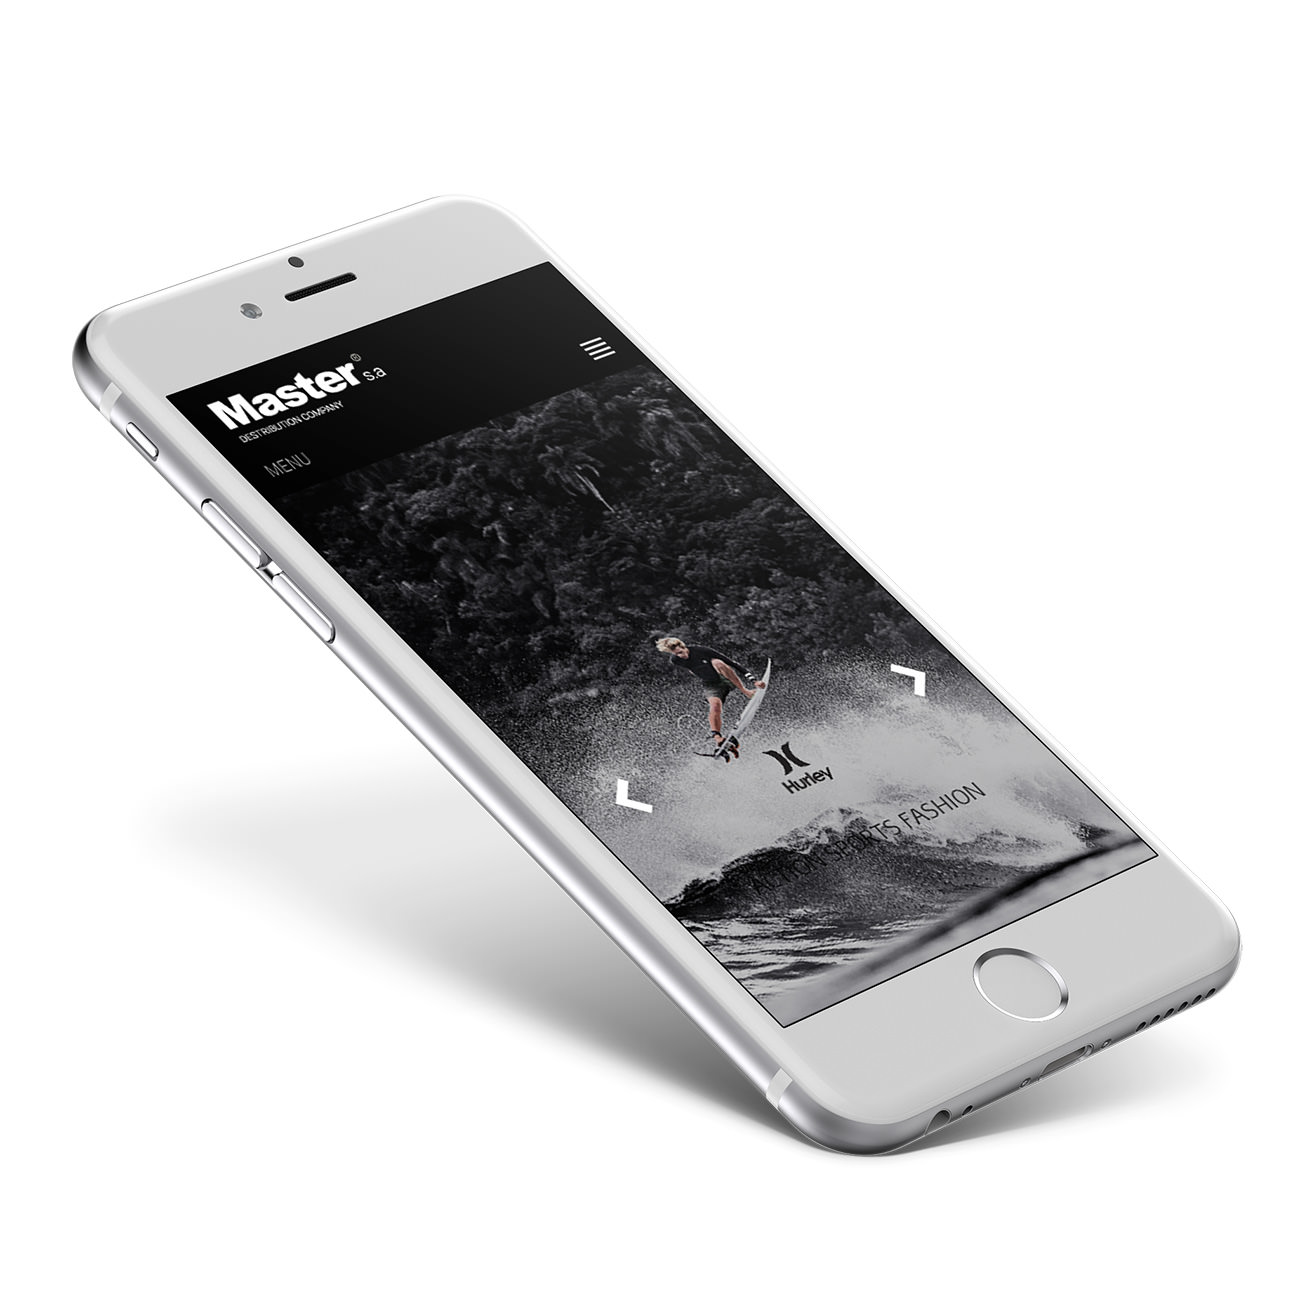 iphone-master